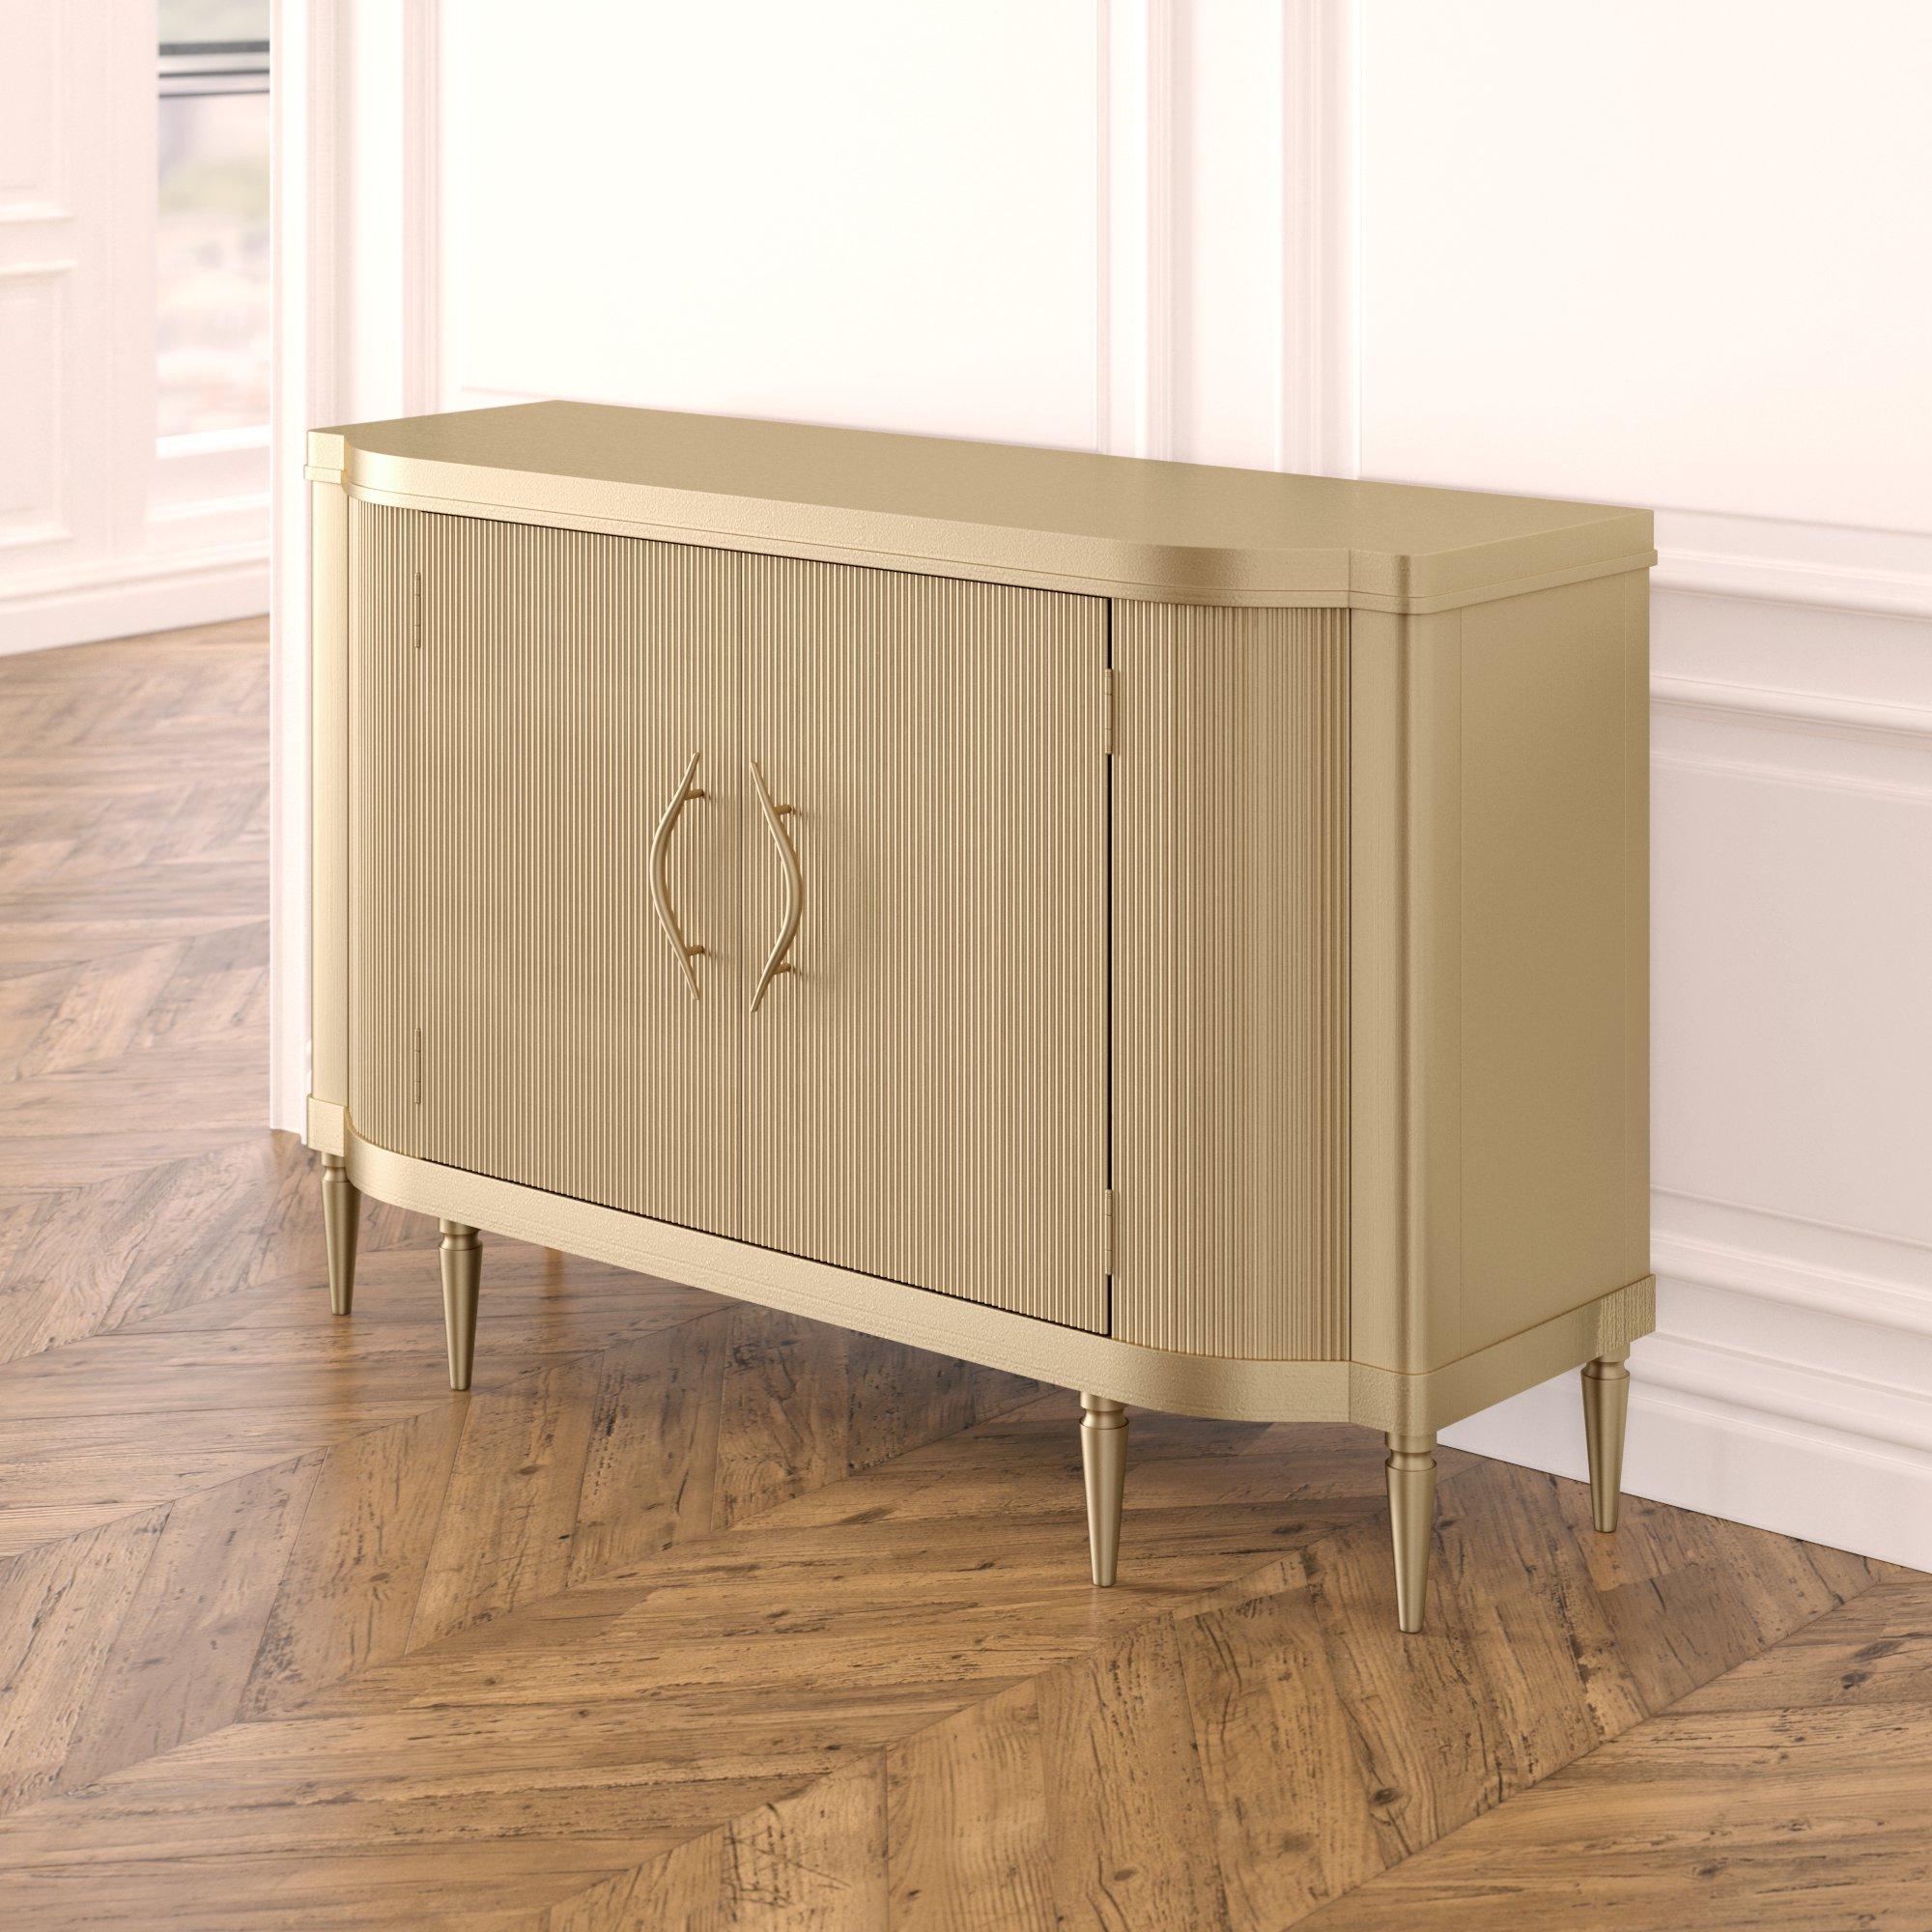 Gold & Silver Sideboards & Buffets You'll Love In 2019 | Wayfair Regarding Wattisham Sideboards (Gallery 15 of 20)